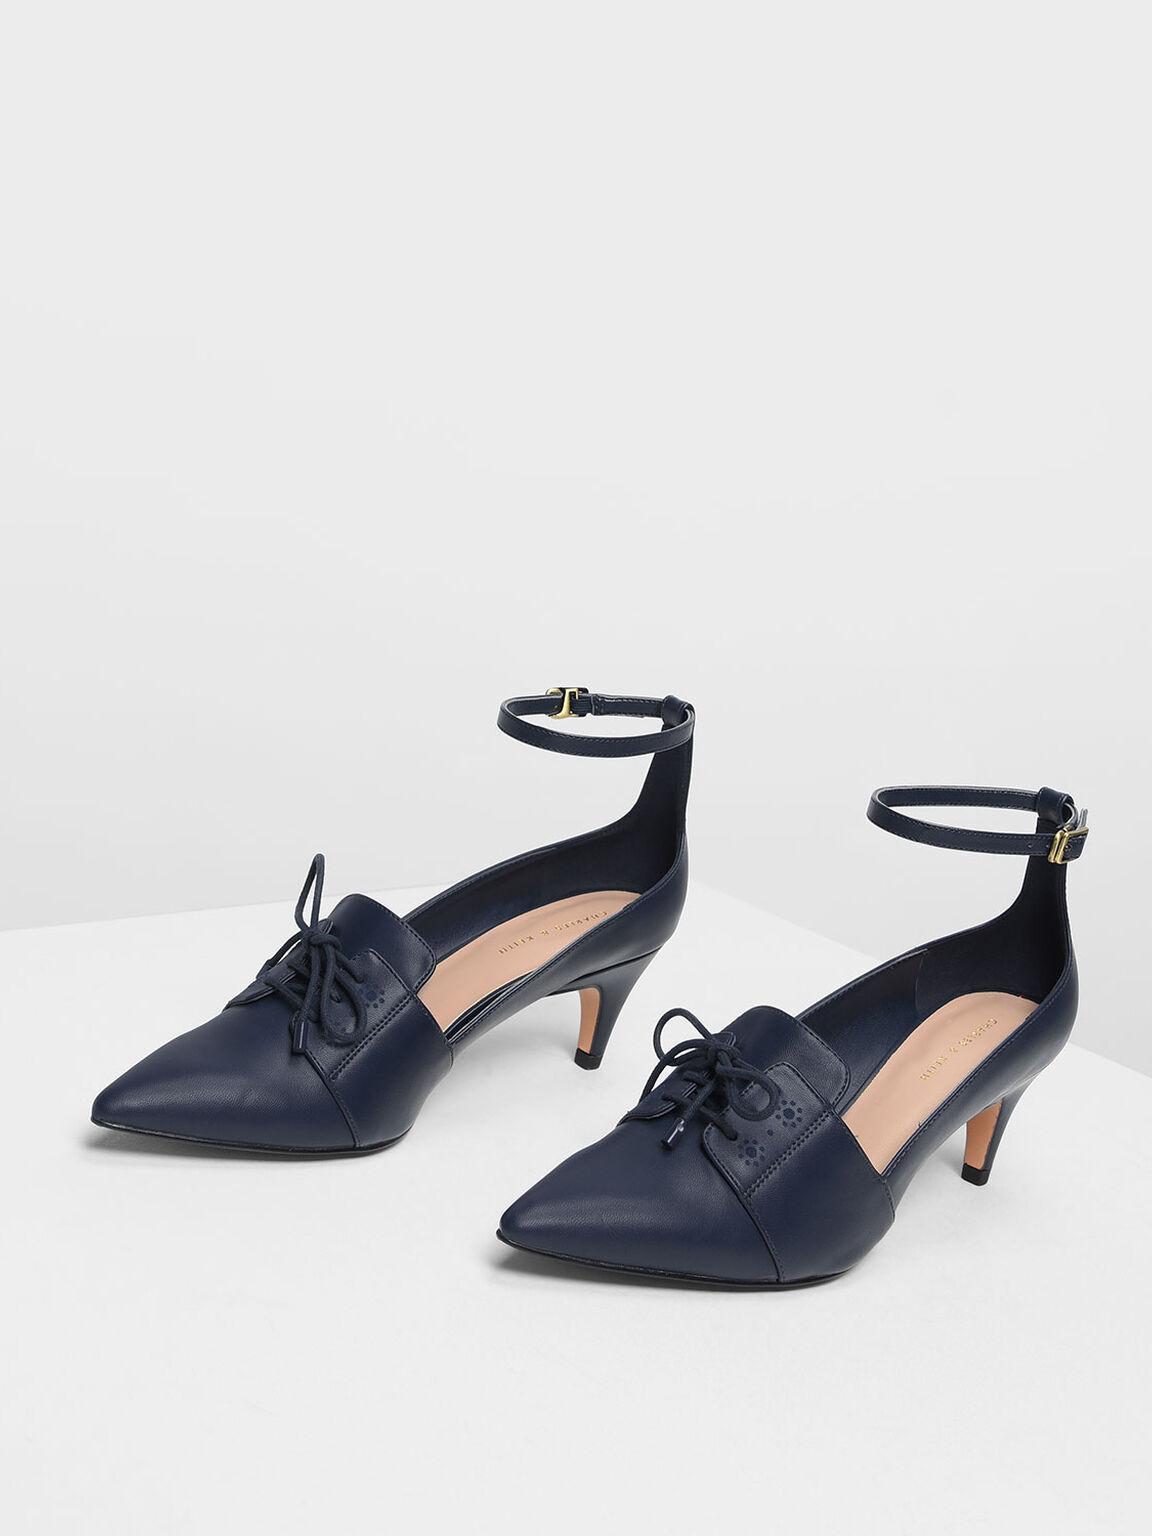 Ankle Strap Pointed Heels, Dark Blue, hi-res